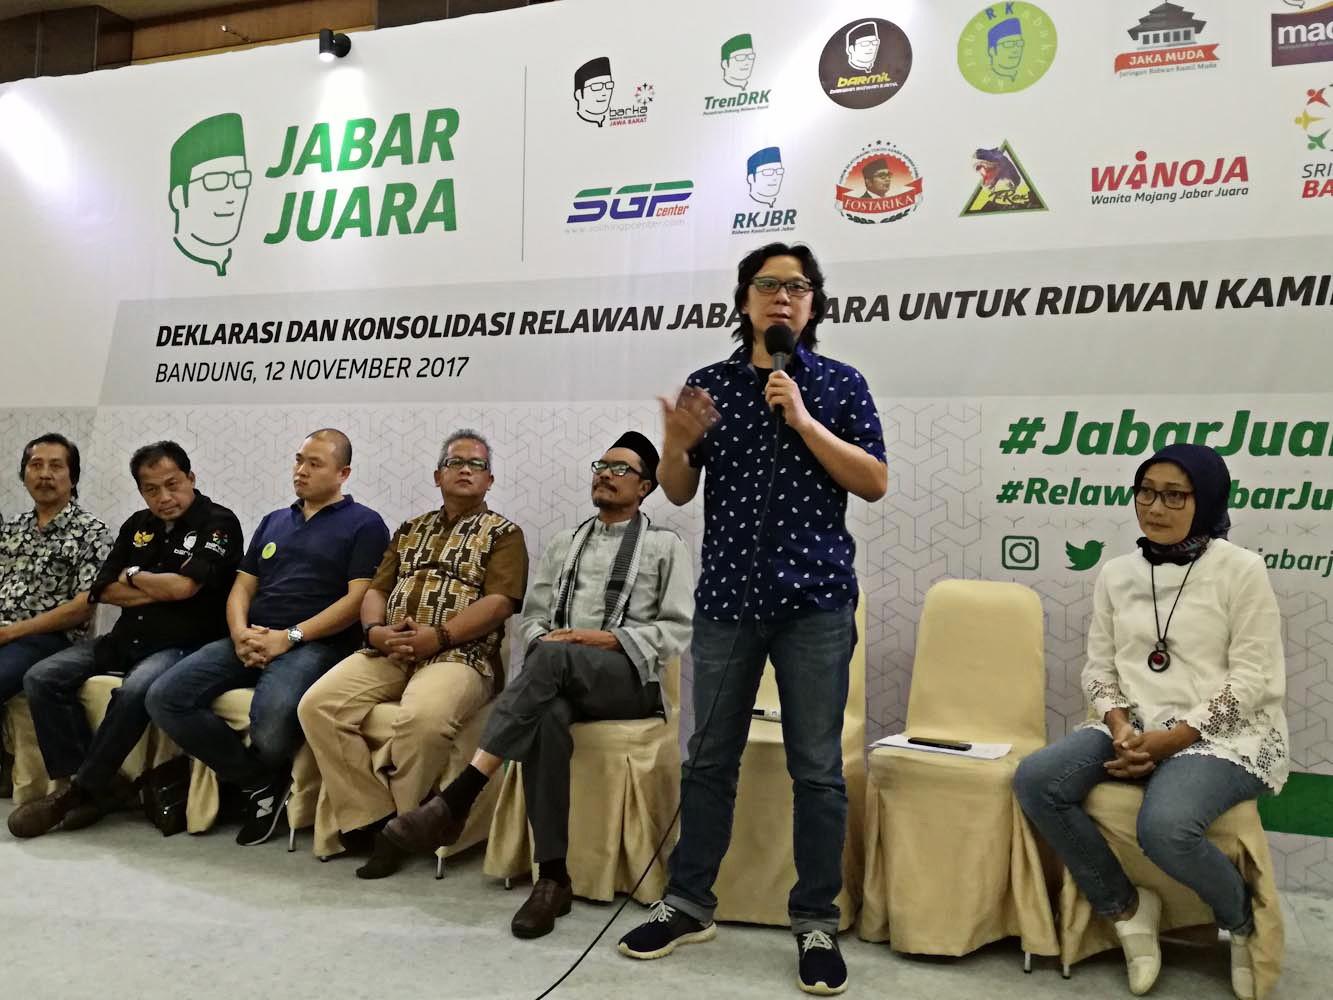 Crowdfunding launched for Bandung Mayor's W. Java governor bid